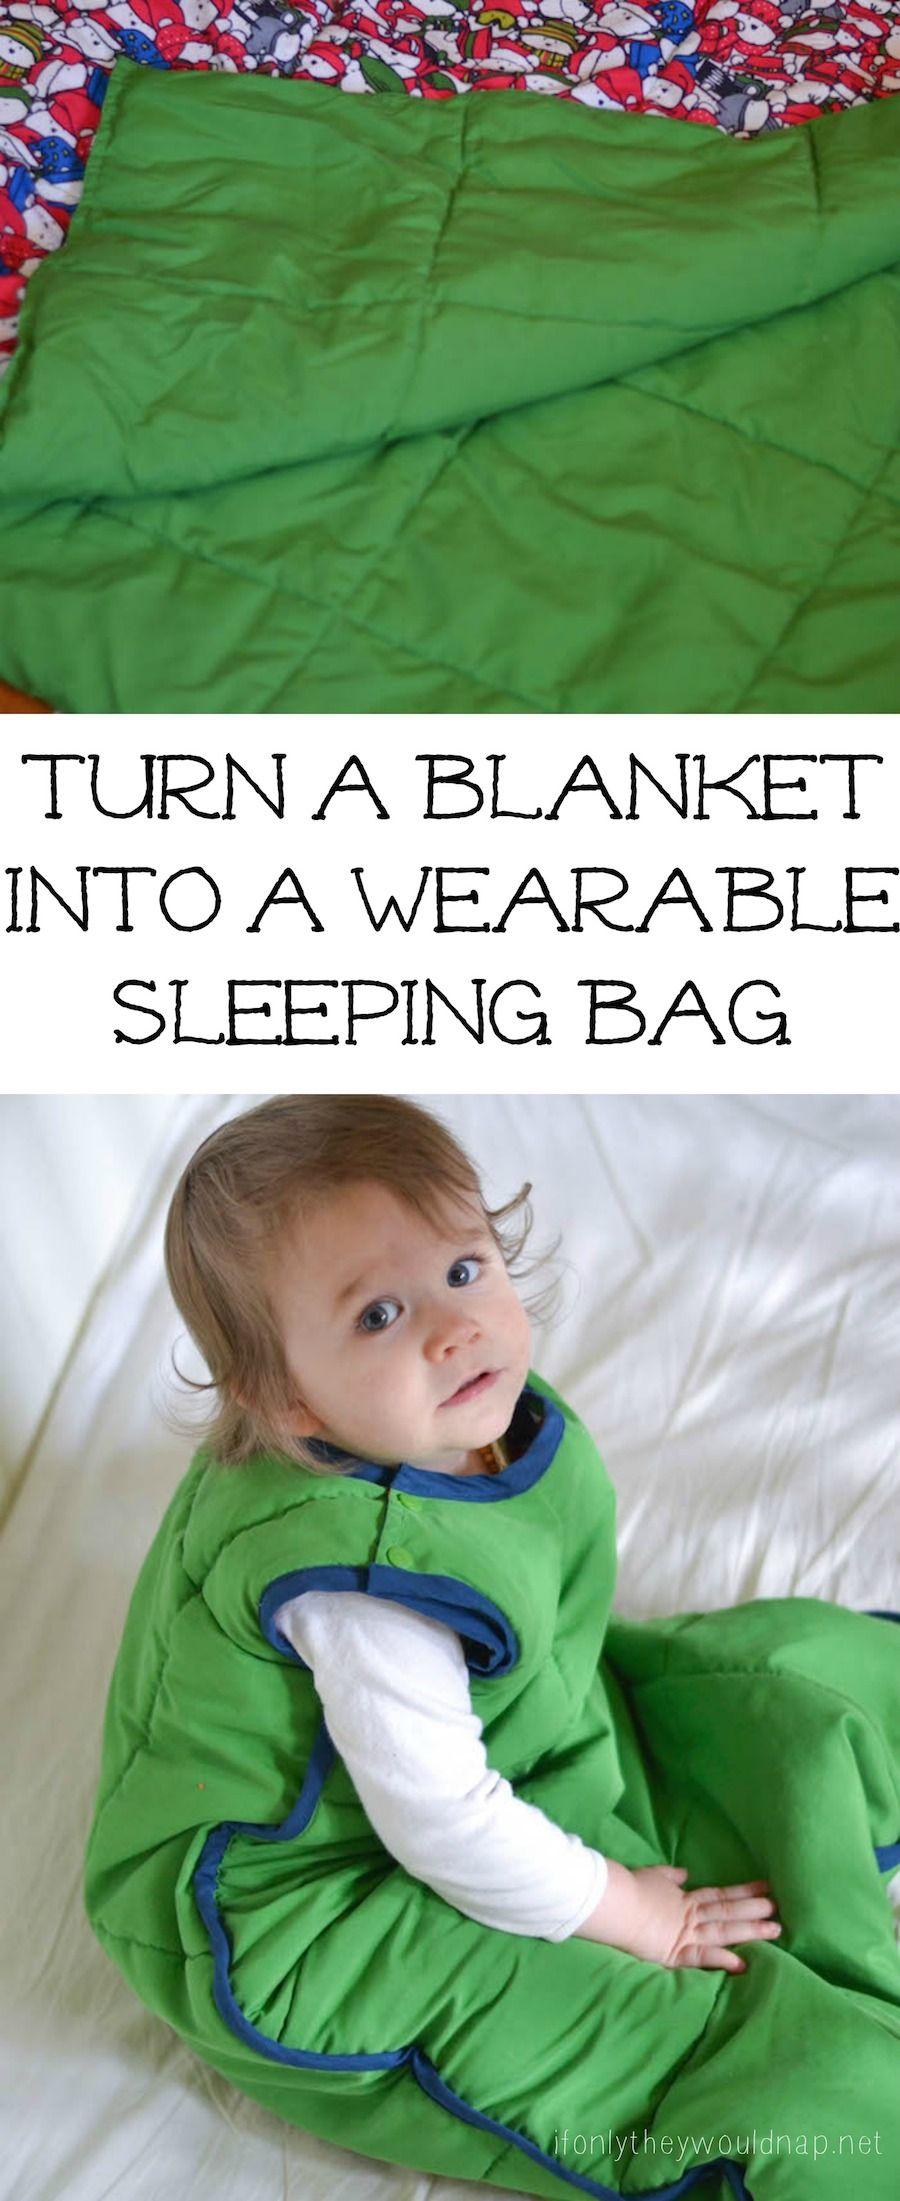 tutorial ohne sm schlafsack aus decke n hen diy turn a blanket into a wearable sleeping bag. Black Bedroom Furniture Sets. Home Design Ideas